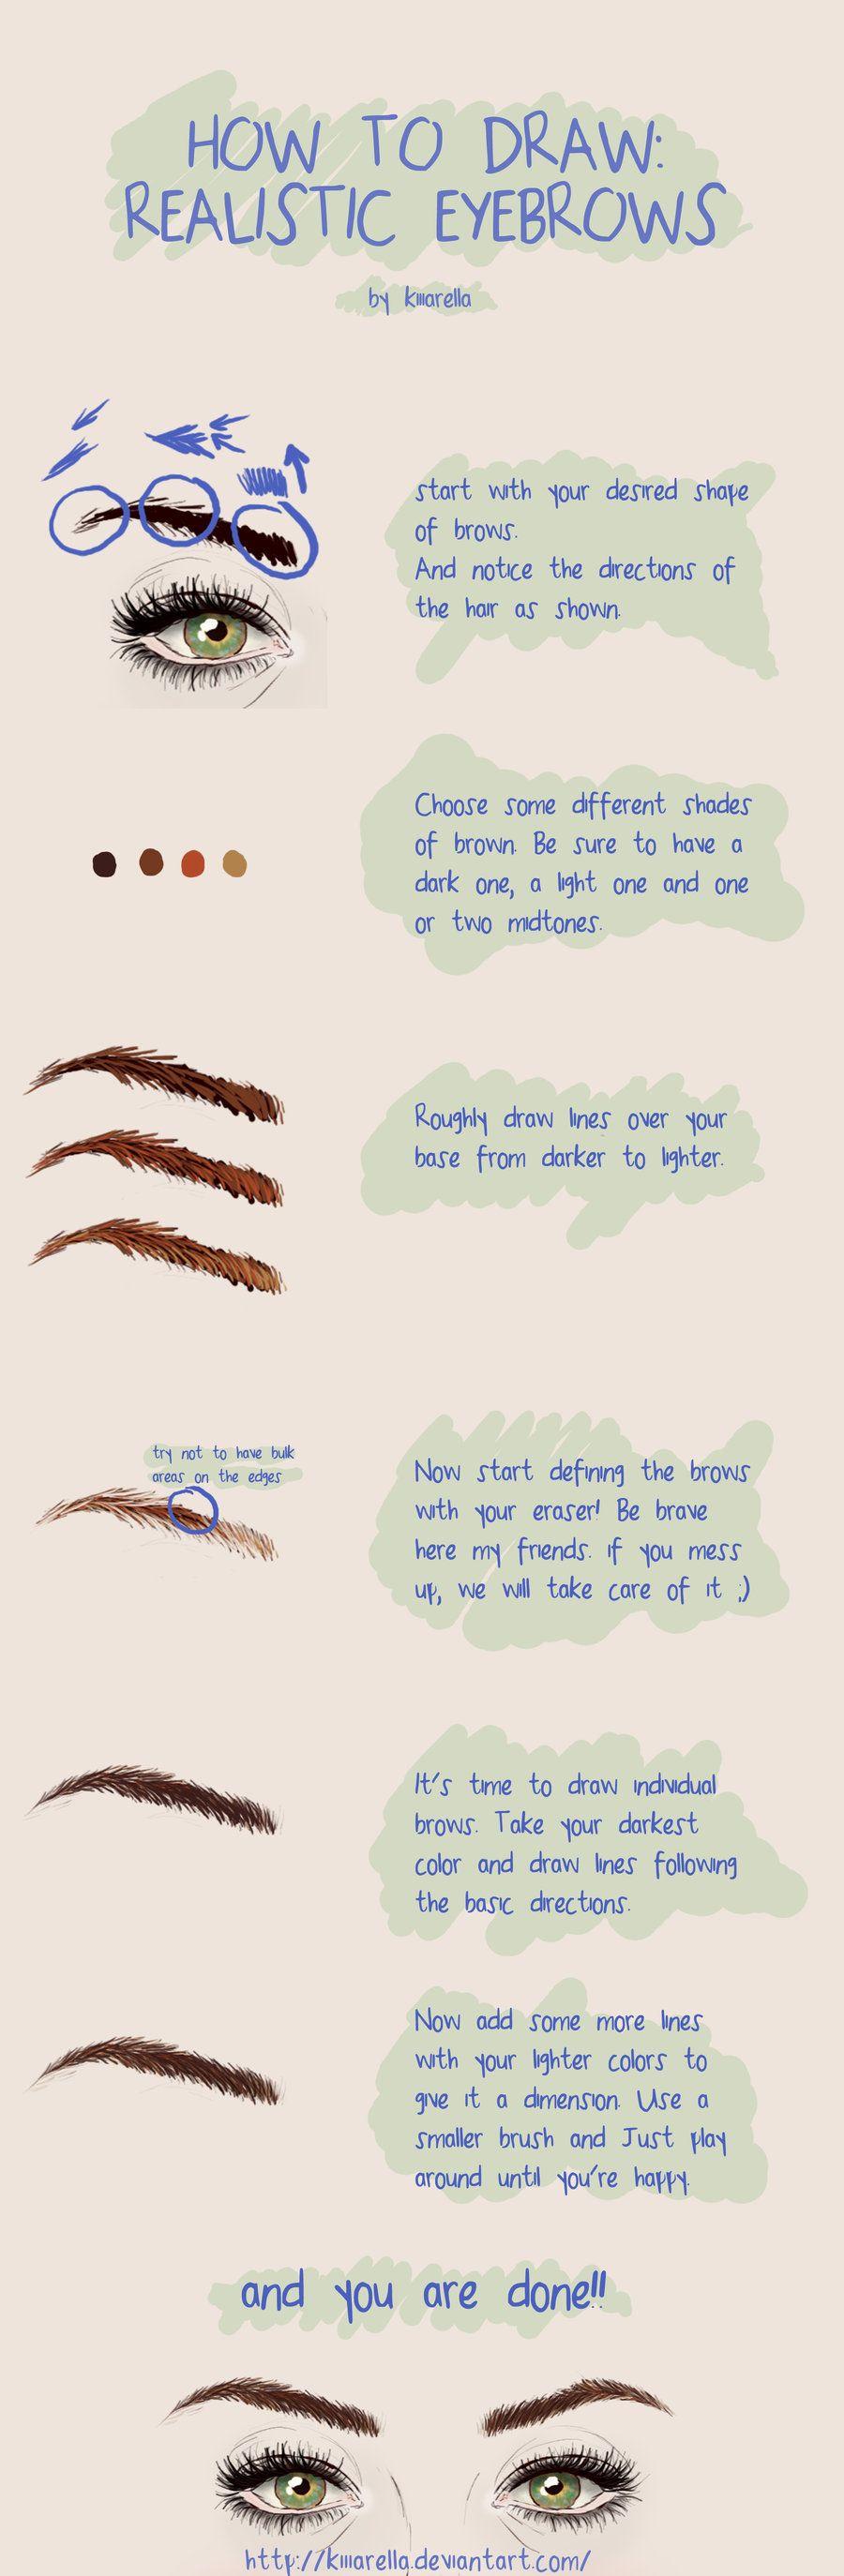 how to draw realistic eyebrows by kiiiarella deviantart com on